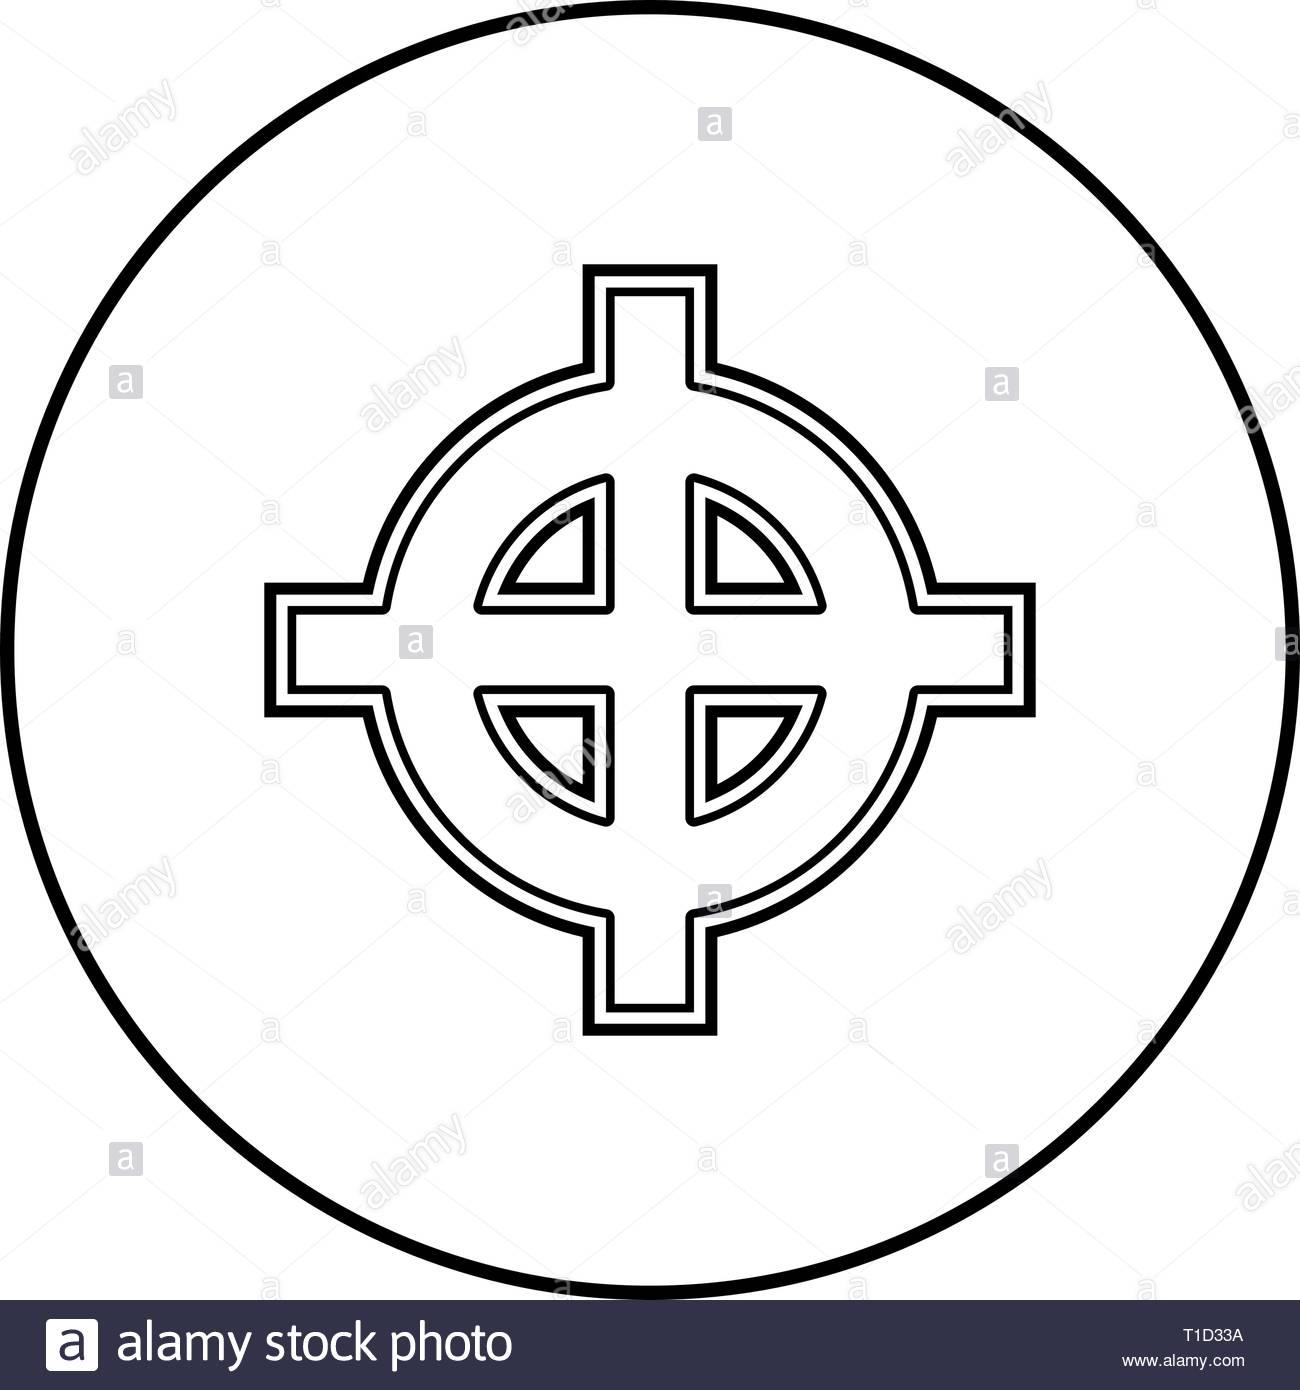 Celtic cross white superiority icon outline black color